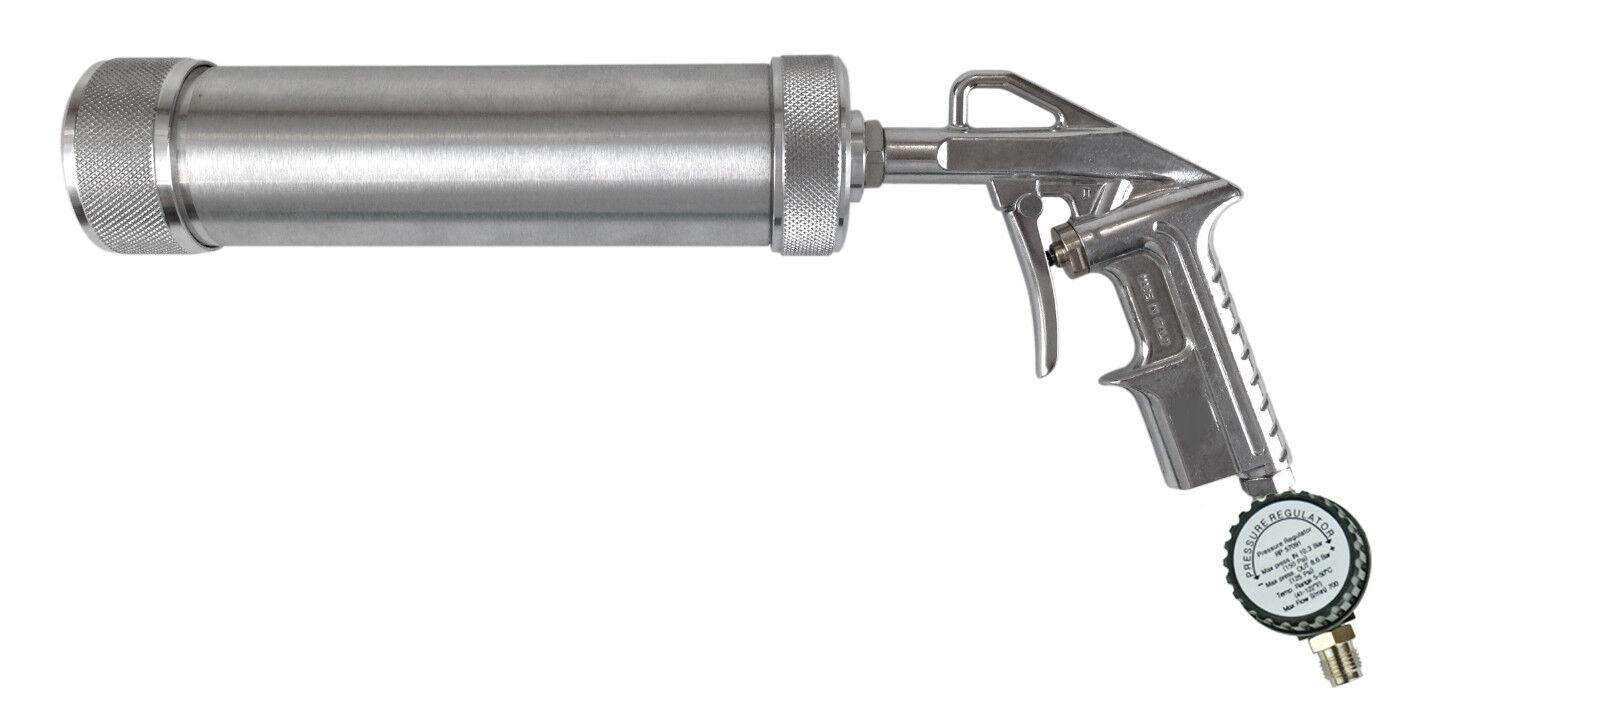 Pneumatic Air Caulking Gun With Air Flow Regulator Caulk Dispensing Gun Ebay